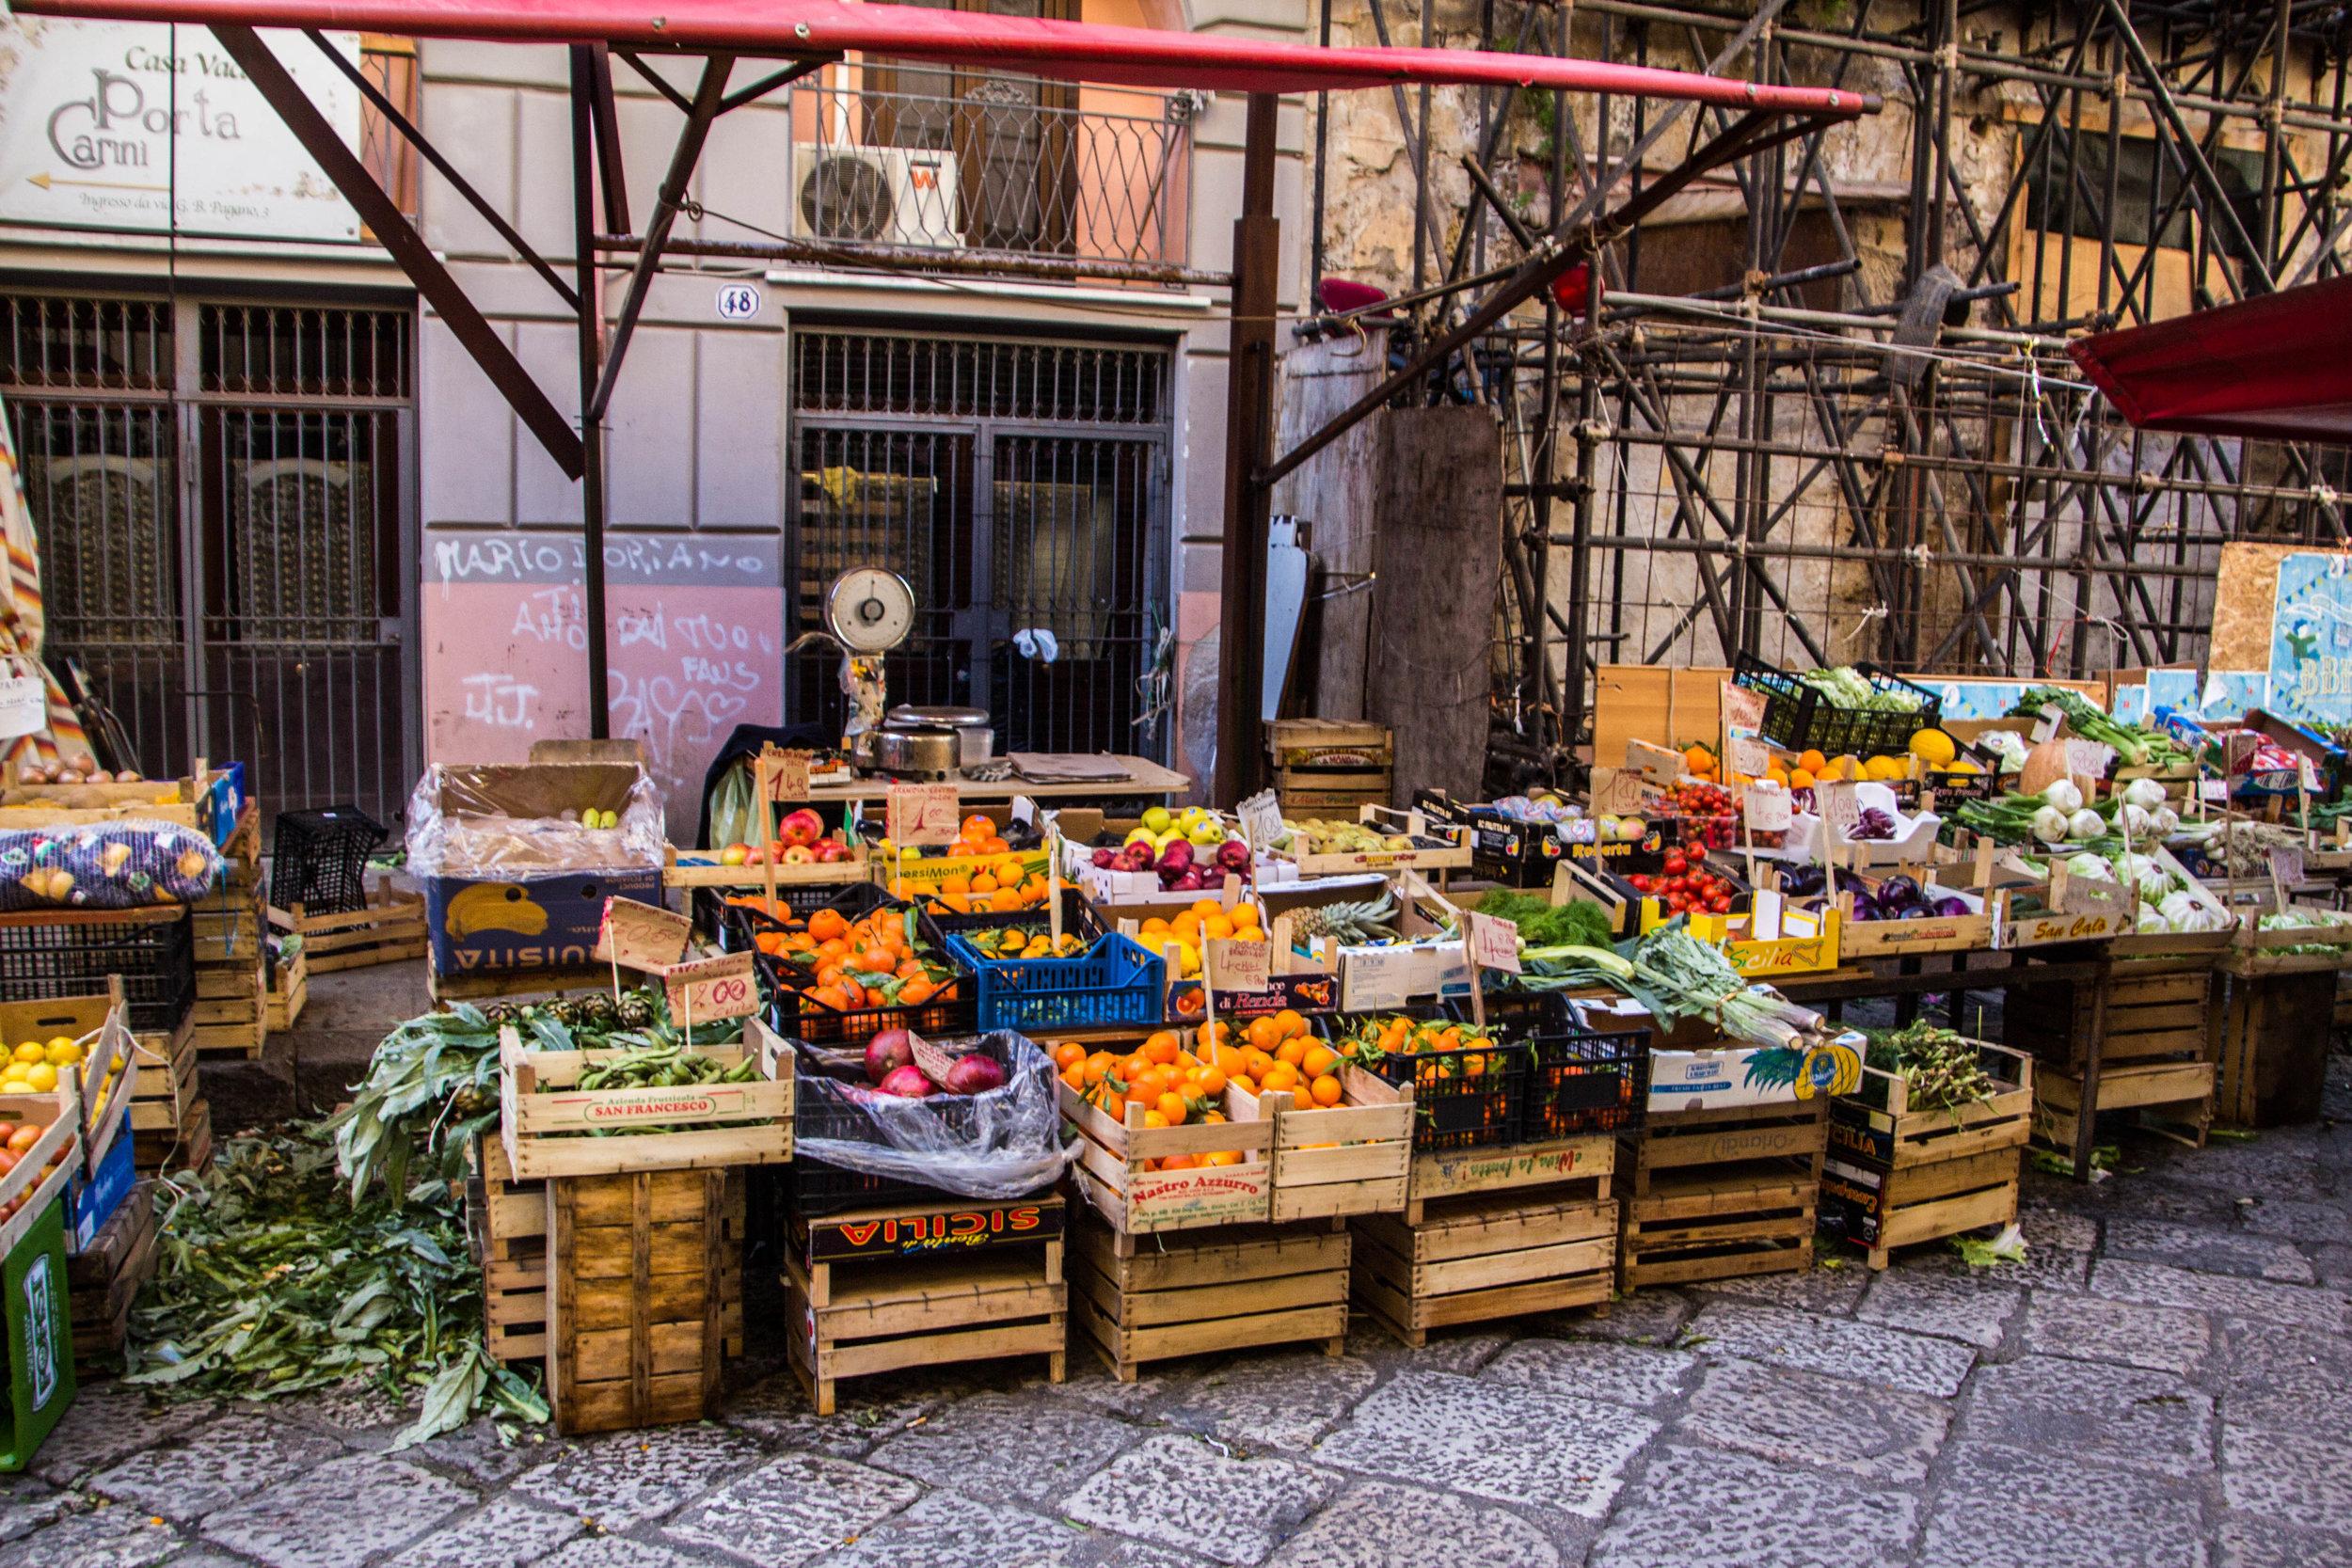 street-markets-palermo-sicily-12.jpg